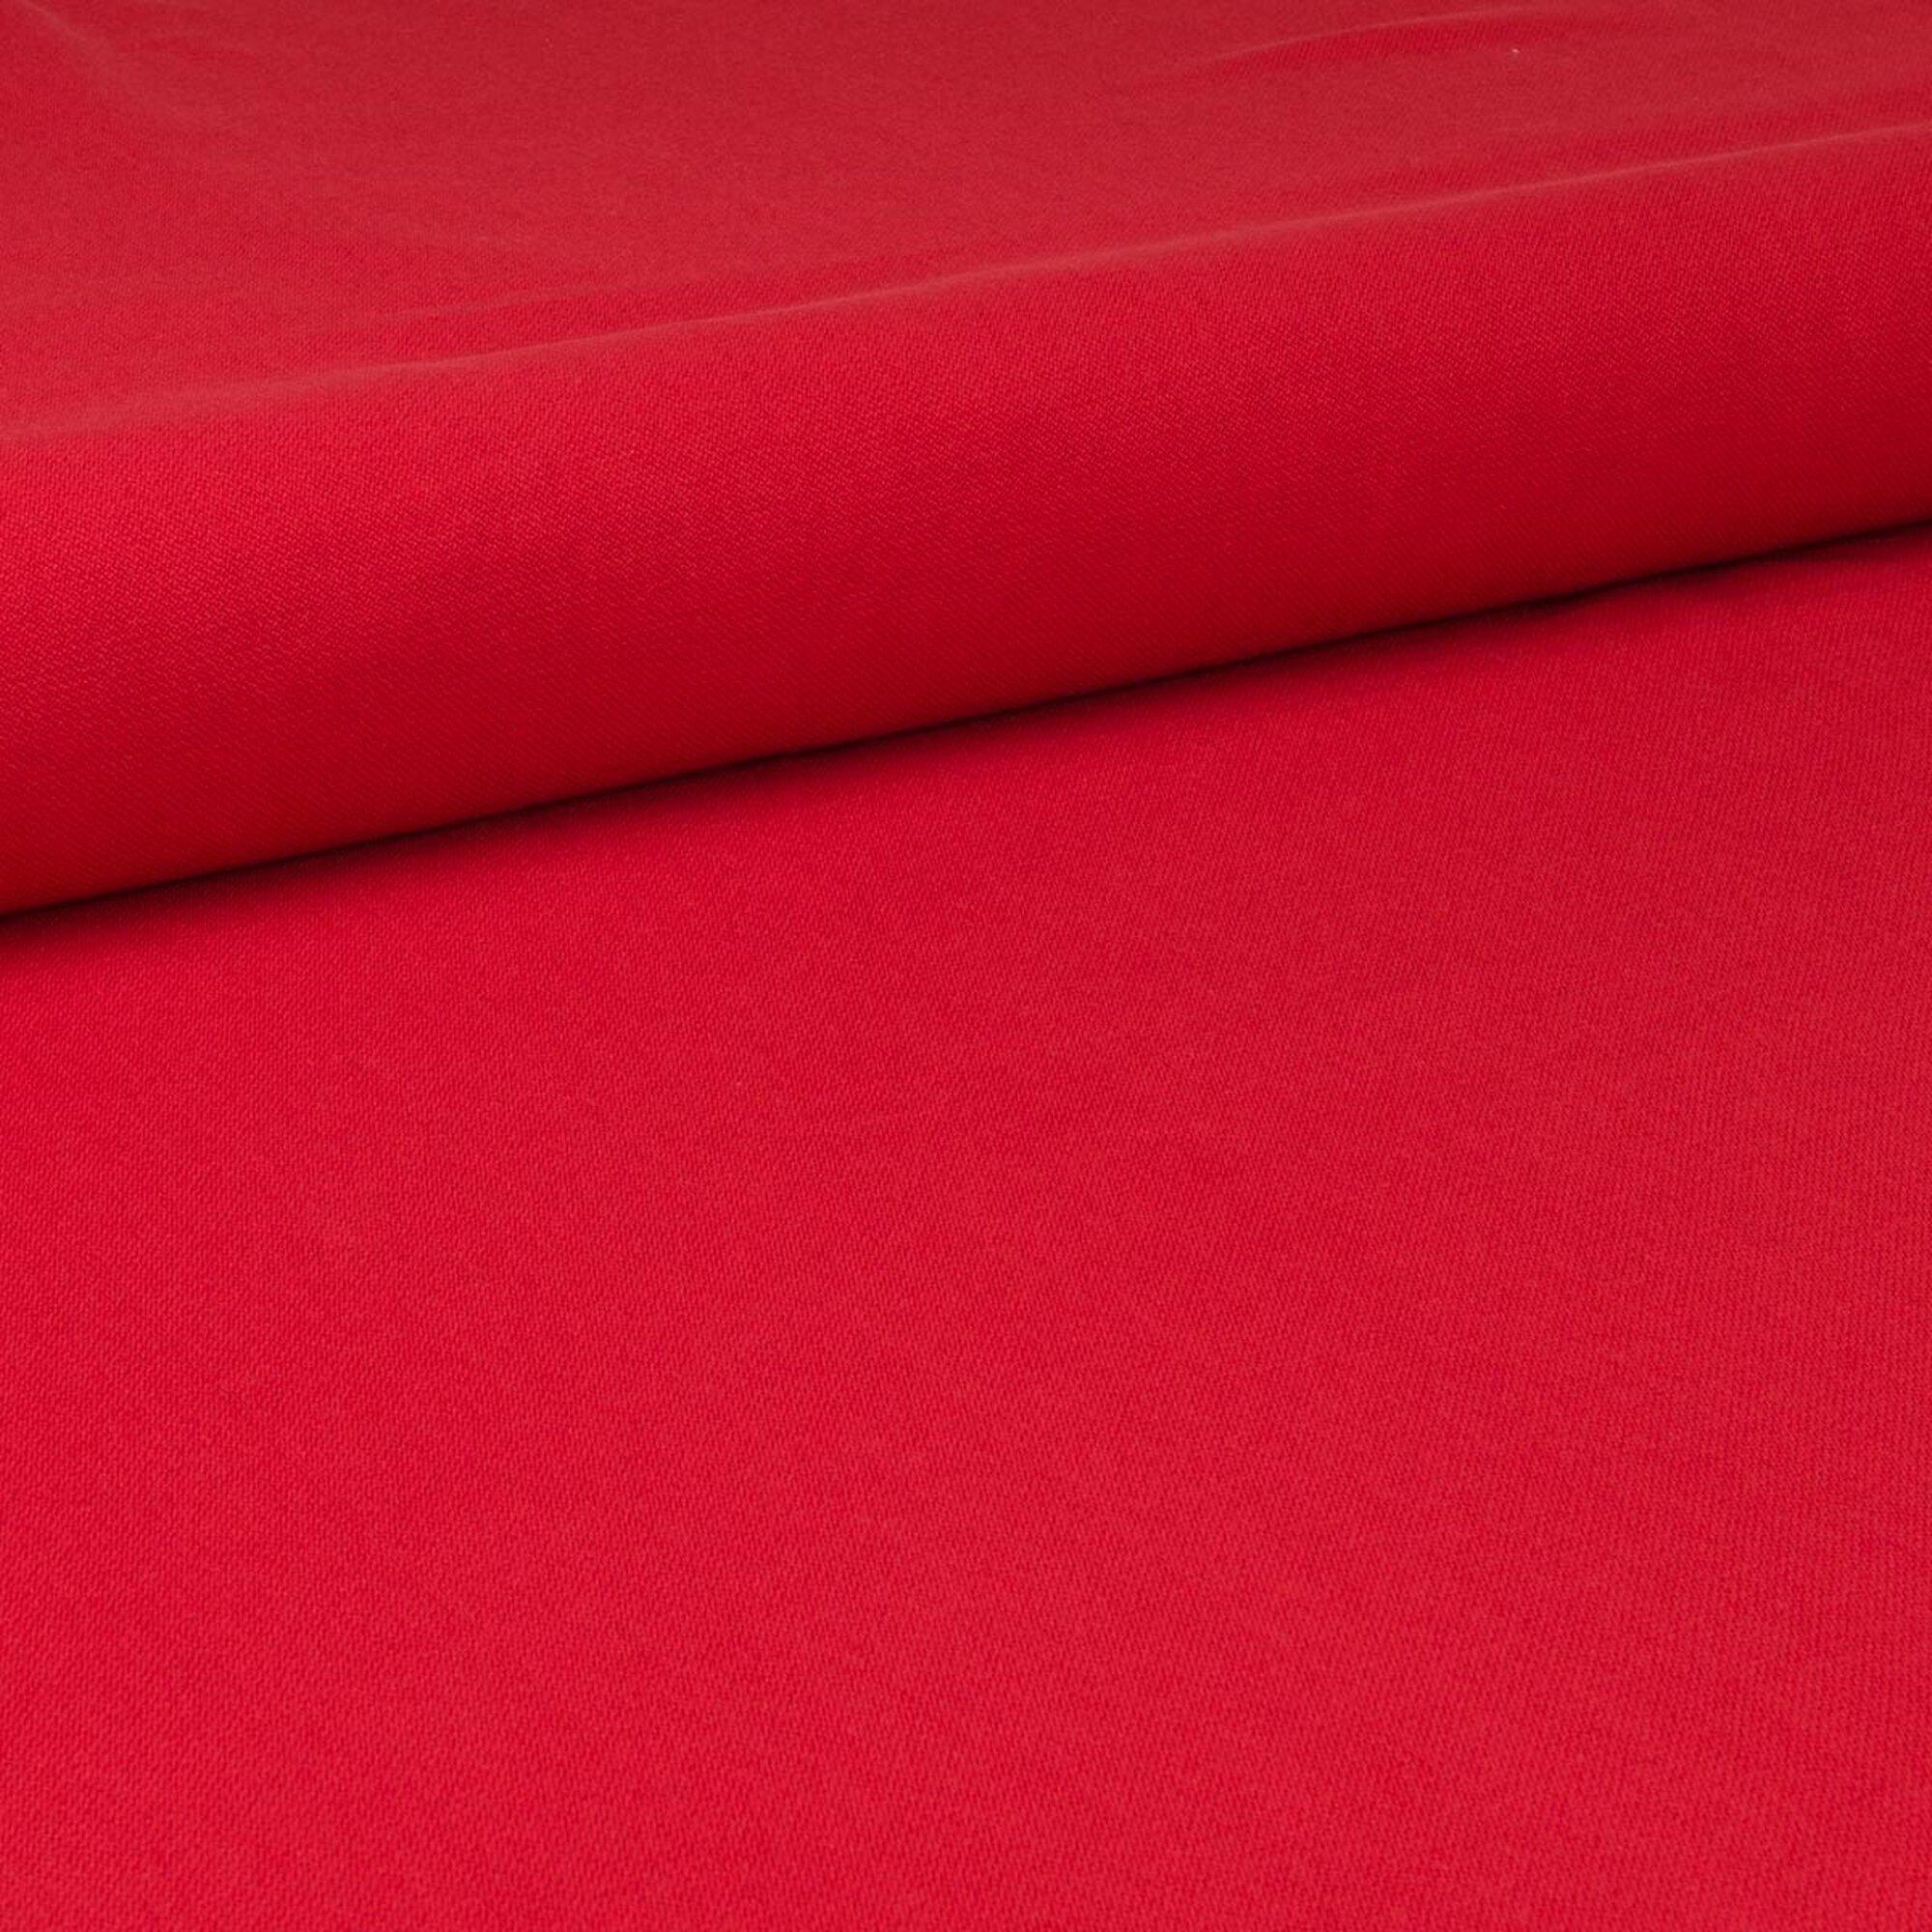 easymaxx-hoppediz-ring-sling-unifarben-rot